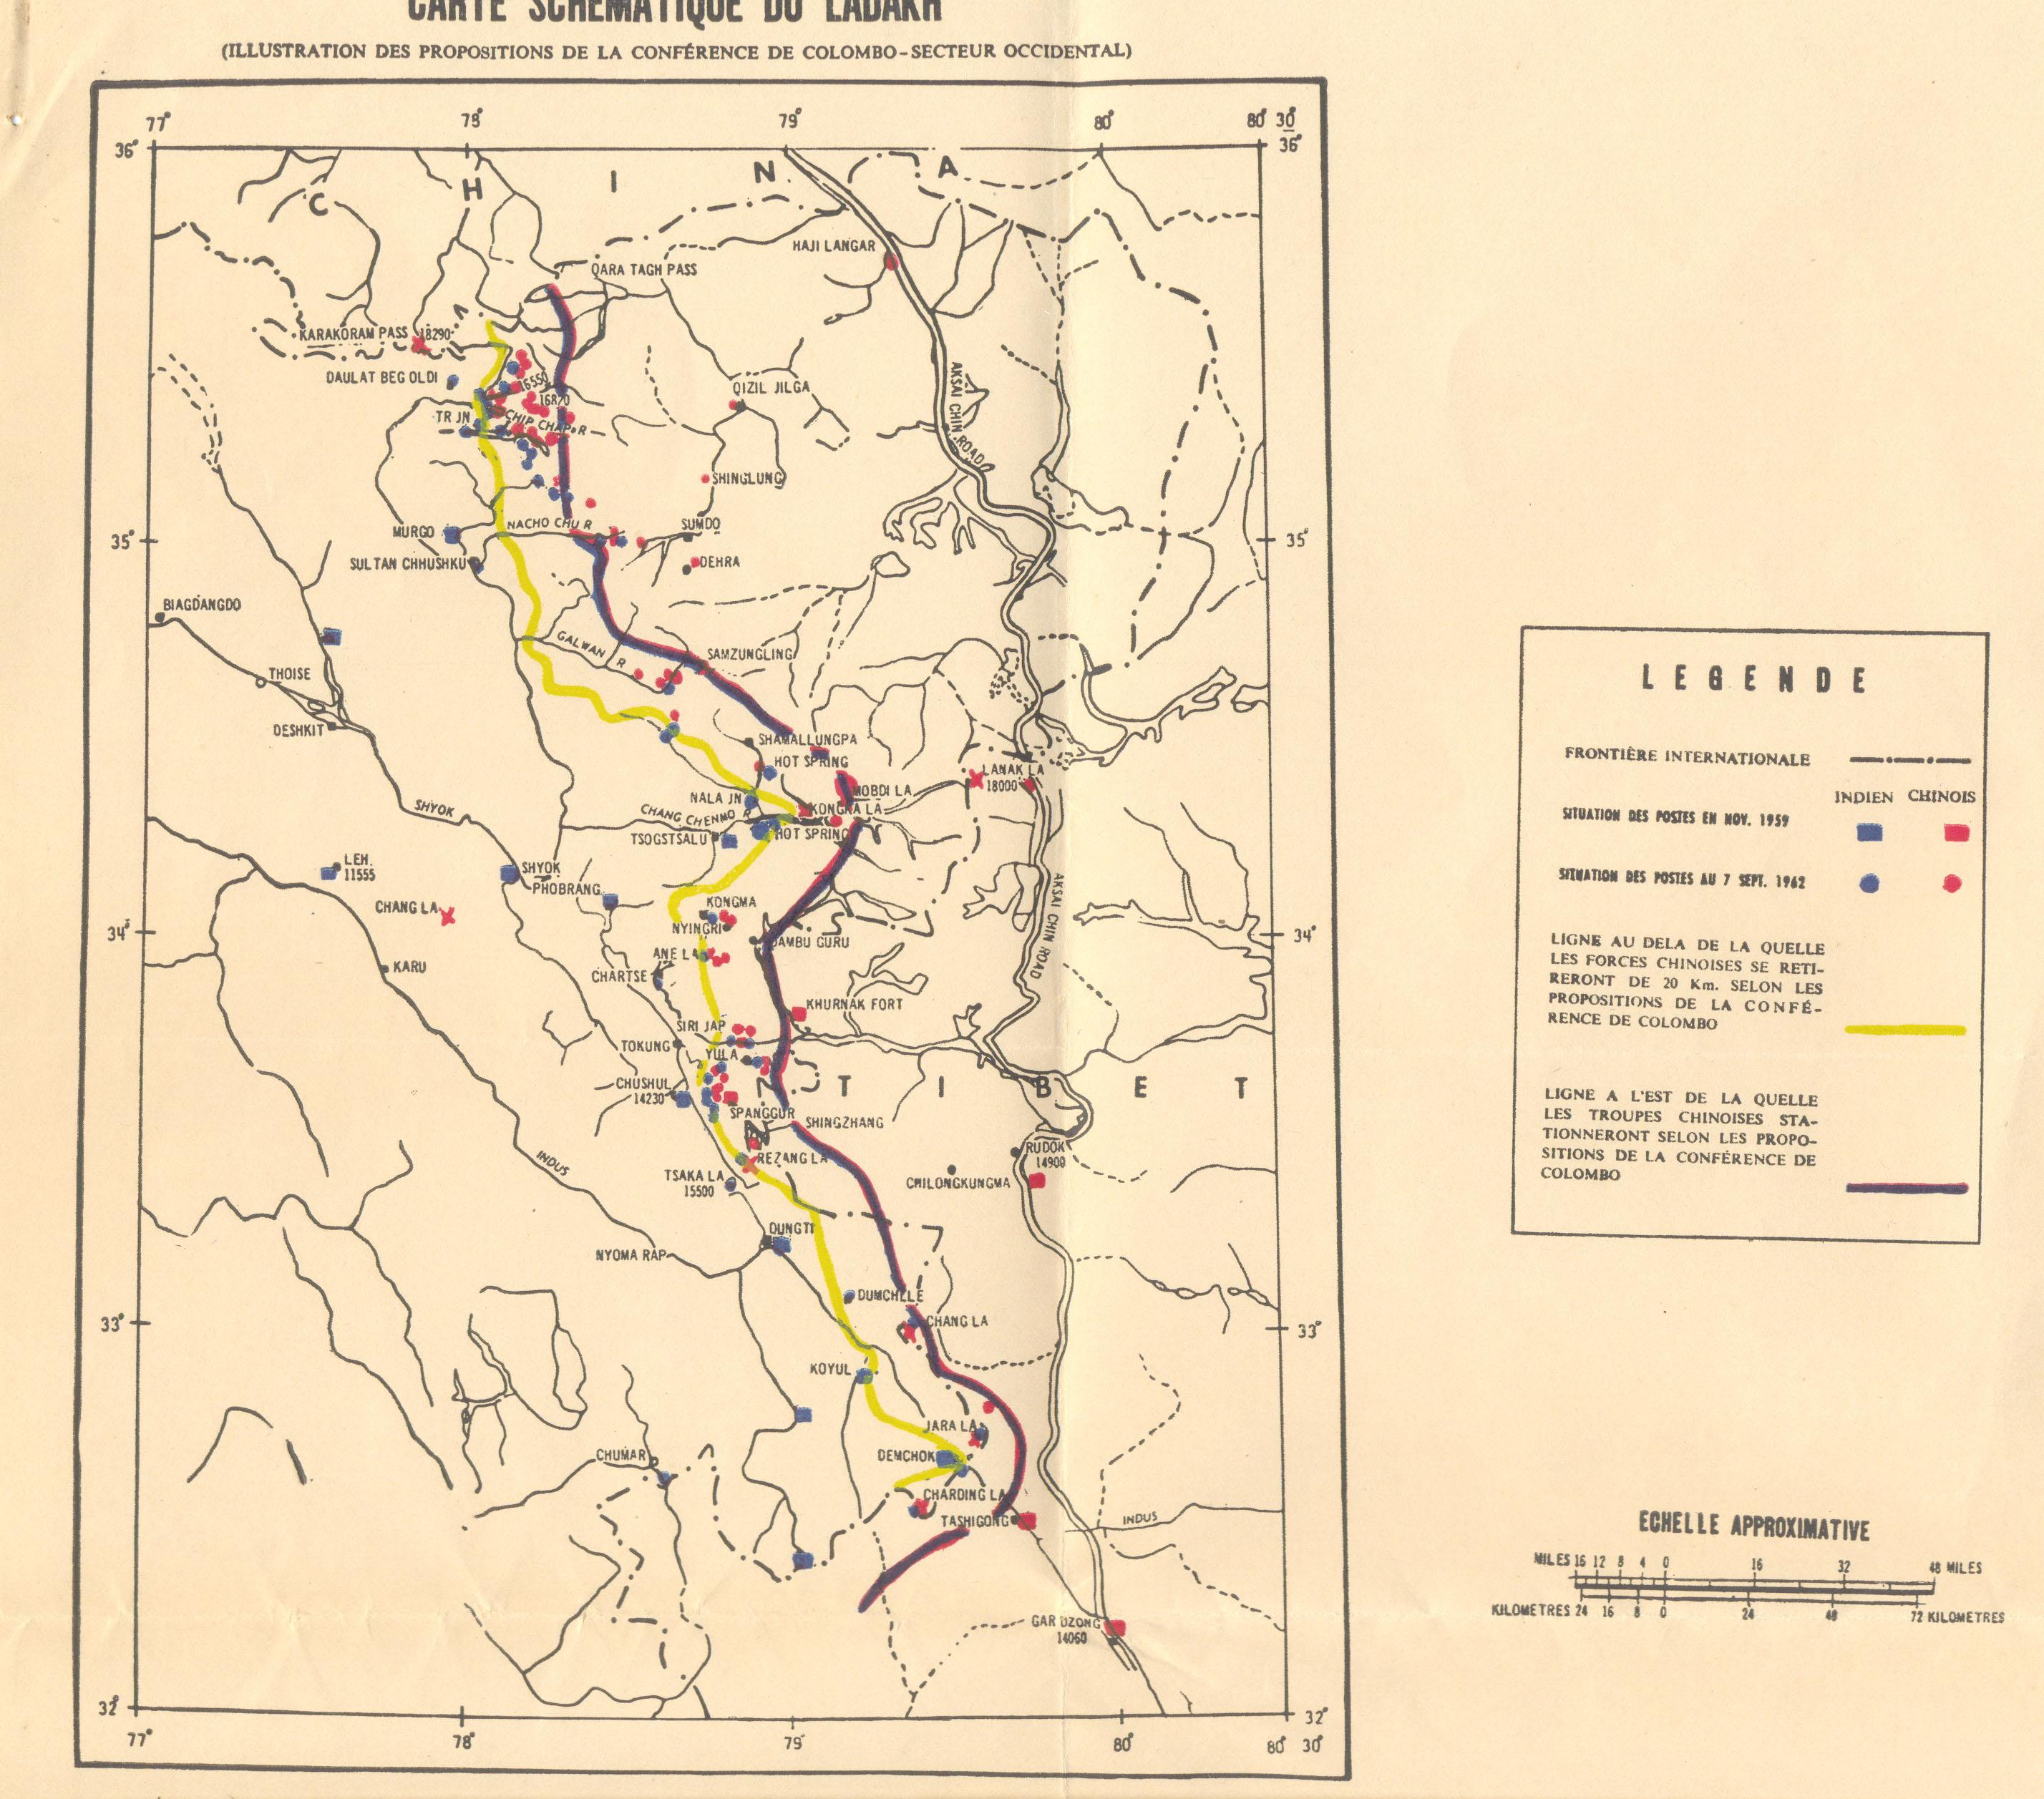 chola incident, 1987 sino-indian skirmish, map of kunlun mountains, map of south asia, tawang town, map of tian shan, azad kashmir, sino-soviet border conflict, indo-pak war of 1971, map of spratly islands, map of south china sea, map of telangana, map of srinagar, states of india, paracel islands, kalapani river, siachen glacier, arunachal pradesh, map of patiala, map of nicobar islands, map of kashmir, kashmir conflict, indo-bangladesh enclaves, map of sikkim, sino-indian war, karakoram pass, map of punjab, line of actual control, partition of india, map of arunachal pradesh, map of taklamakan desert, map of india, china–india relations, on map of aksai chin